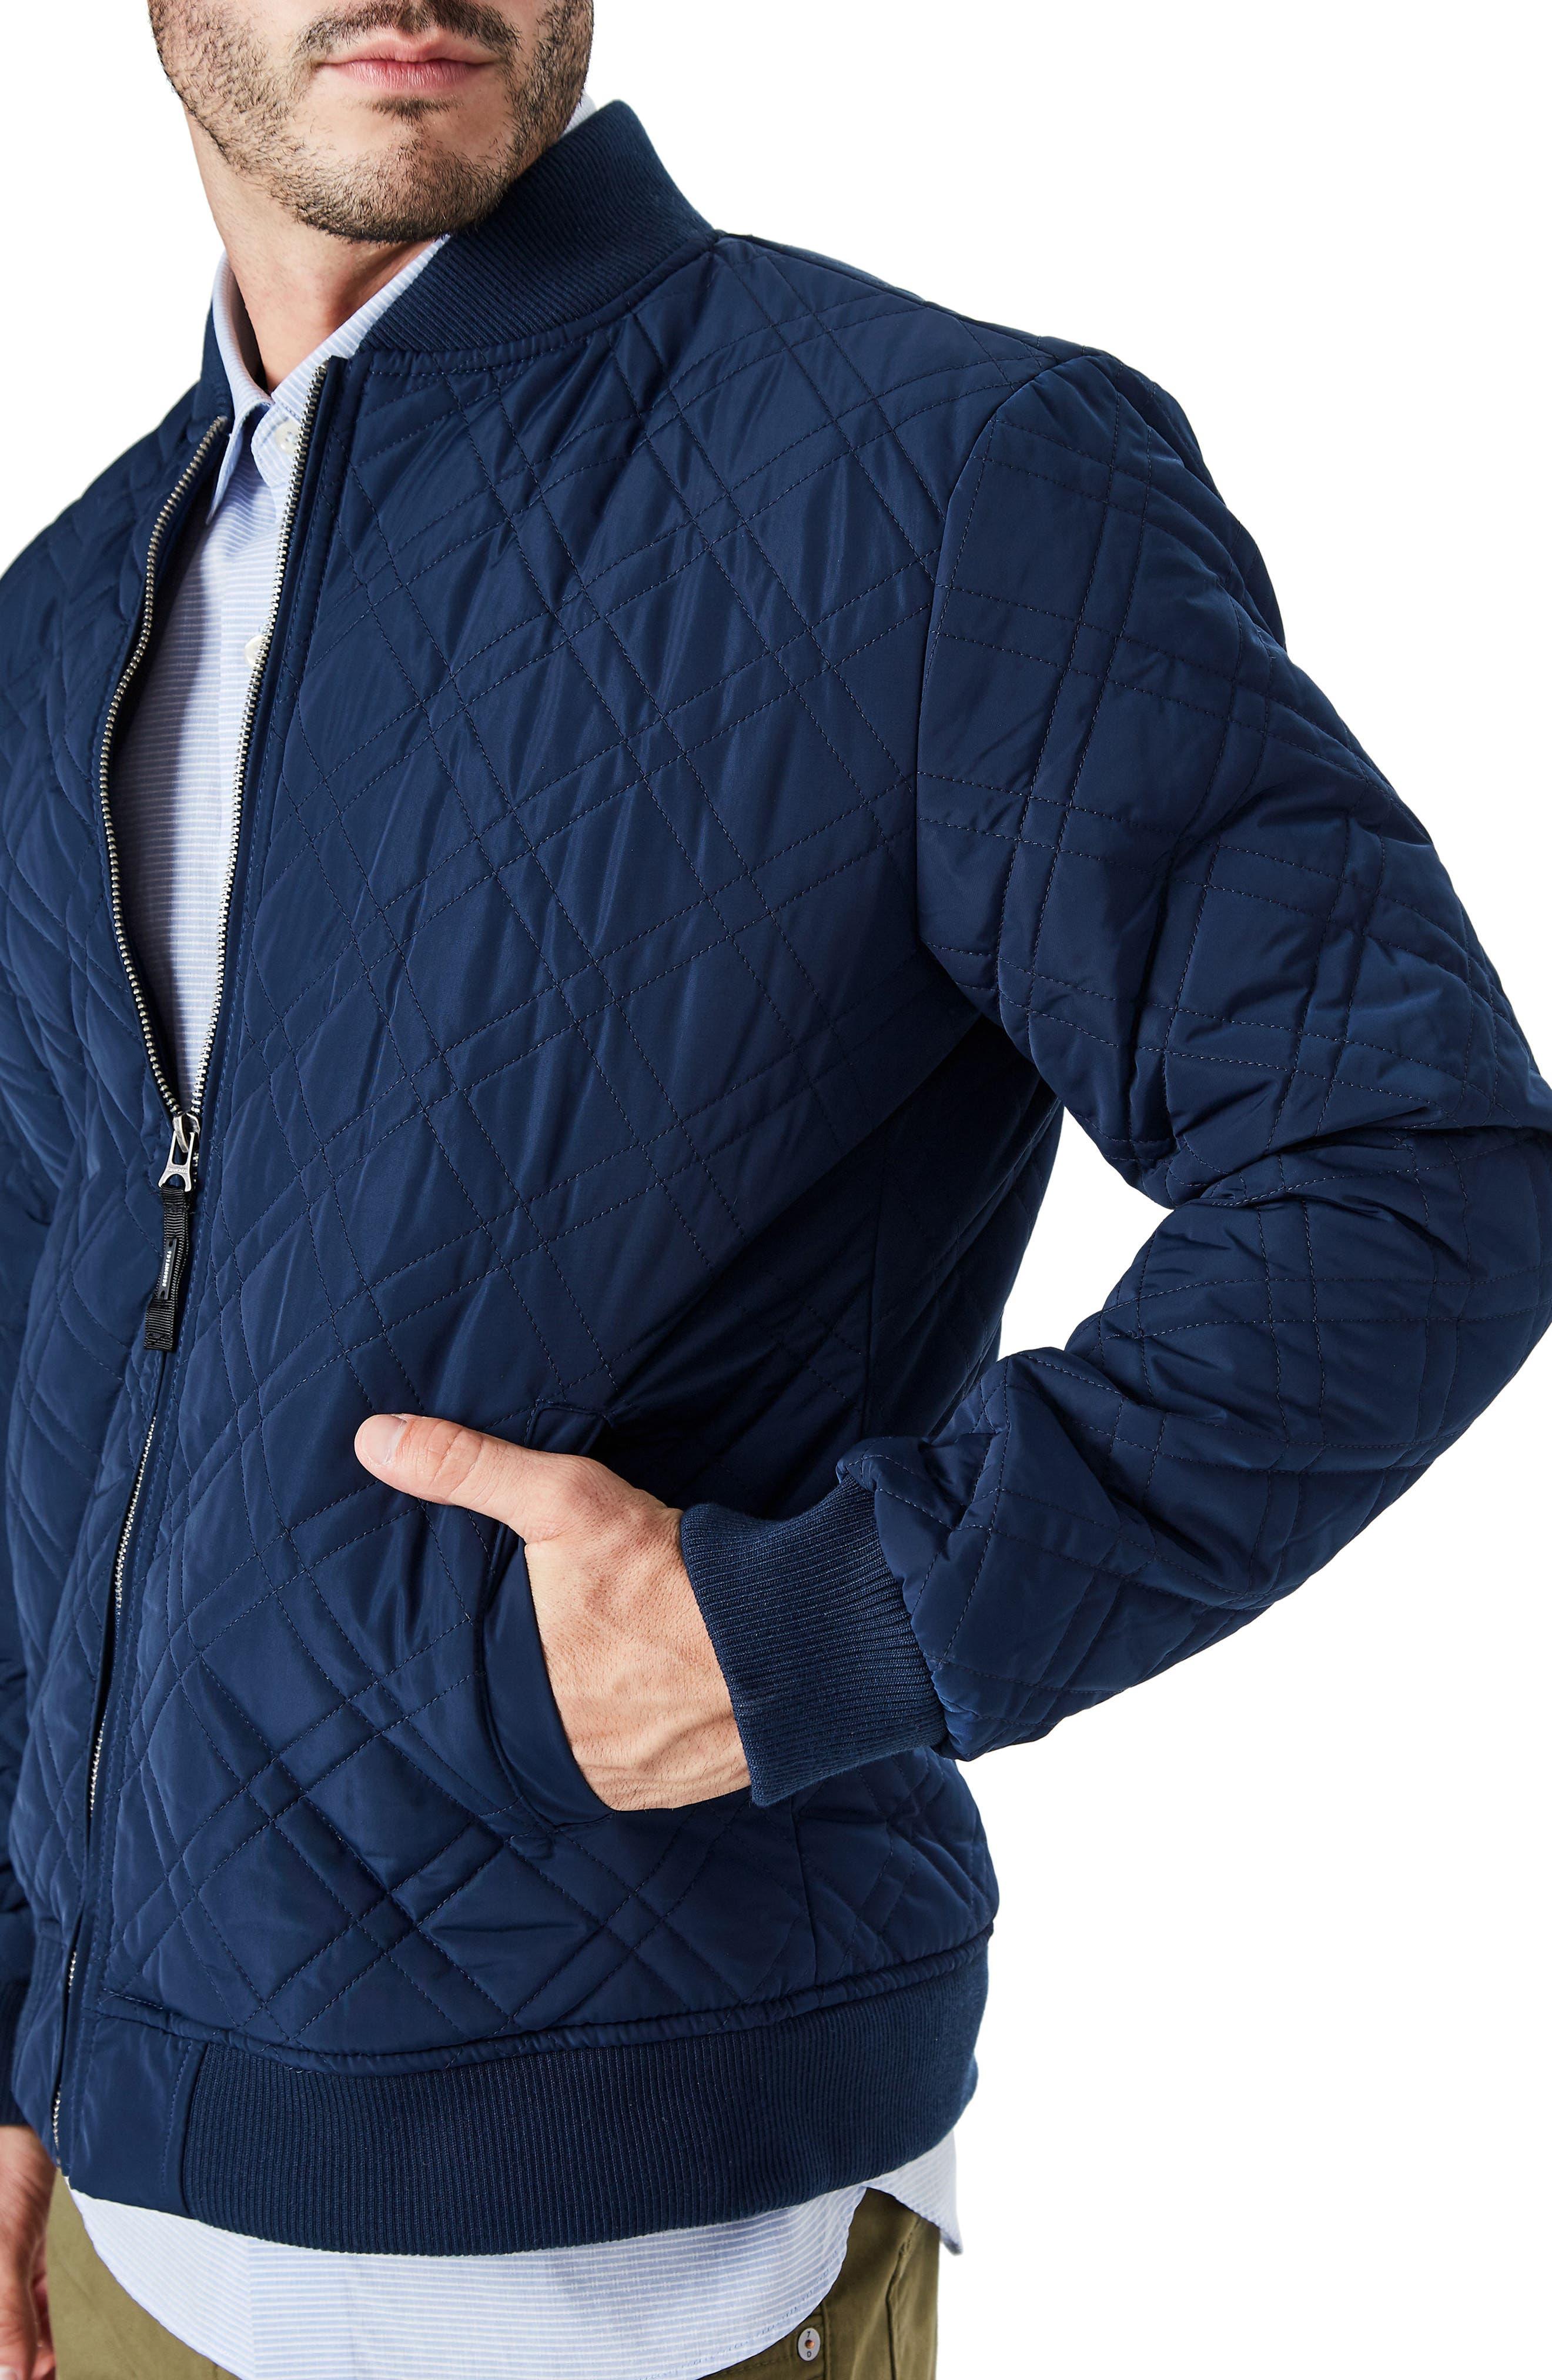 Arca Quilt Jacket,                             Alternate thumbnail 3, color,                             Navy